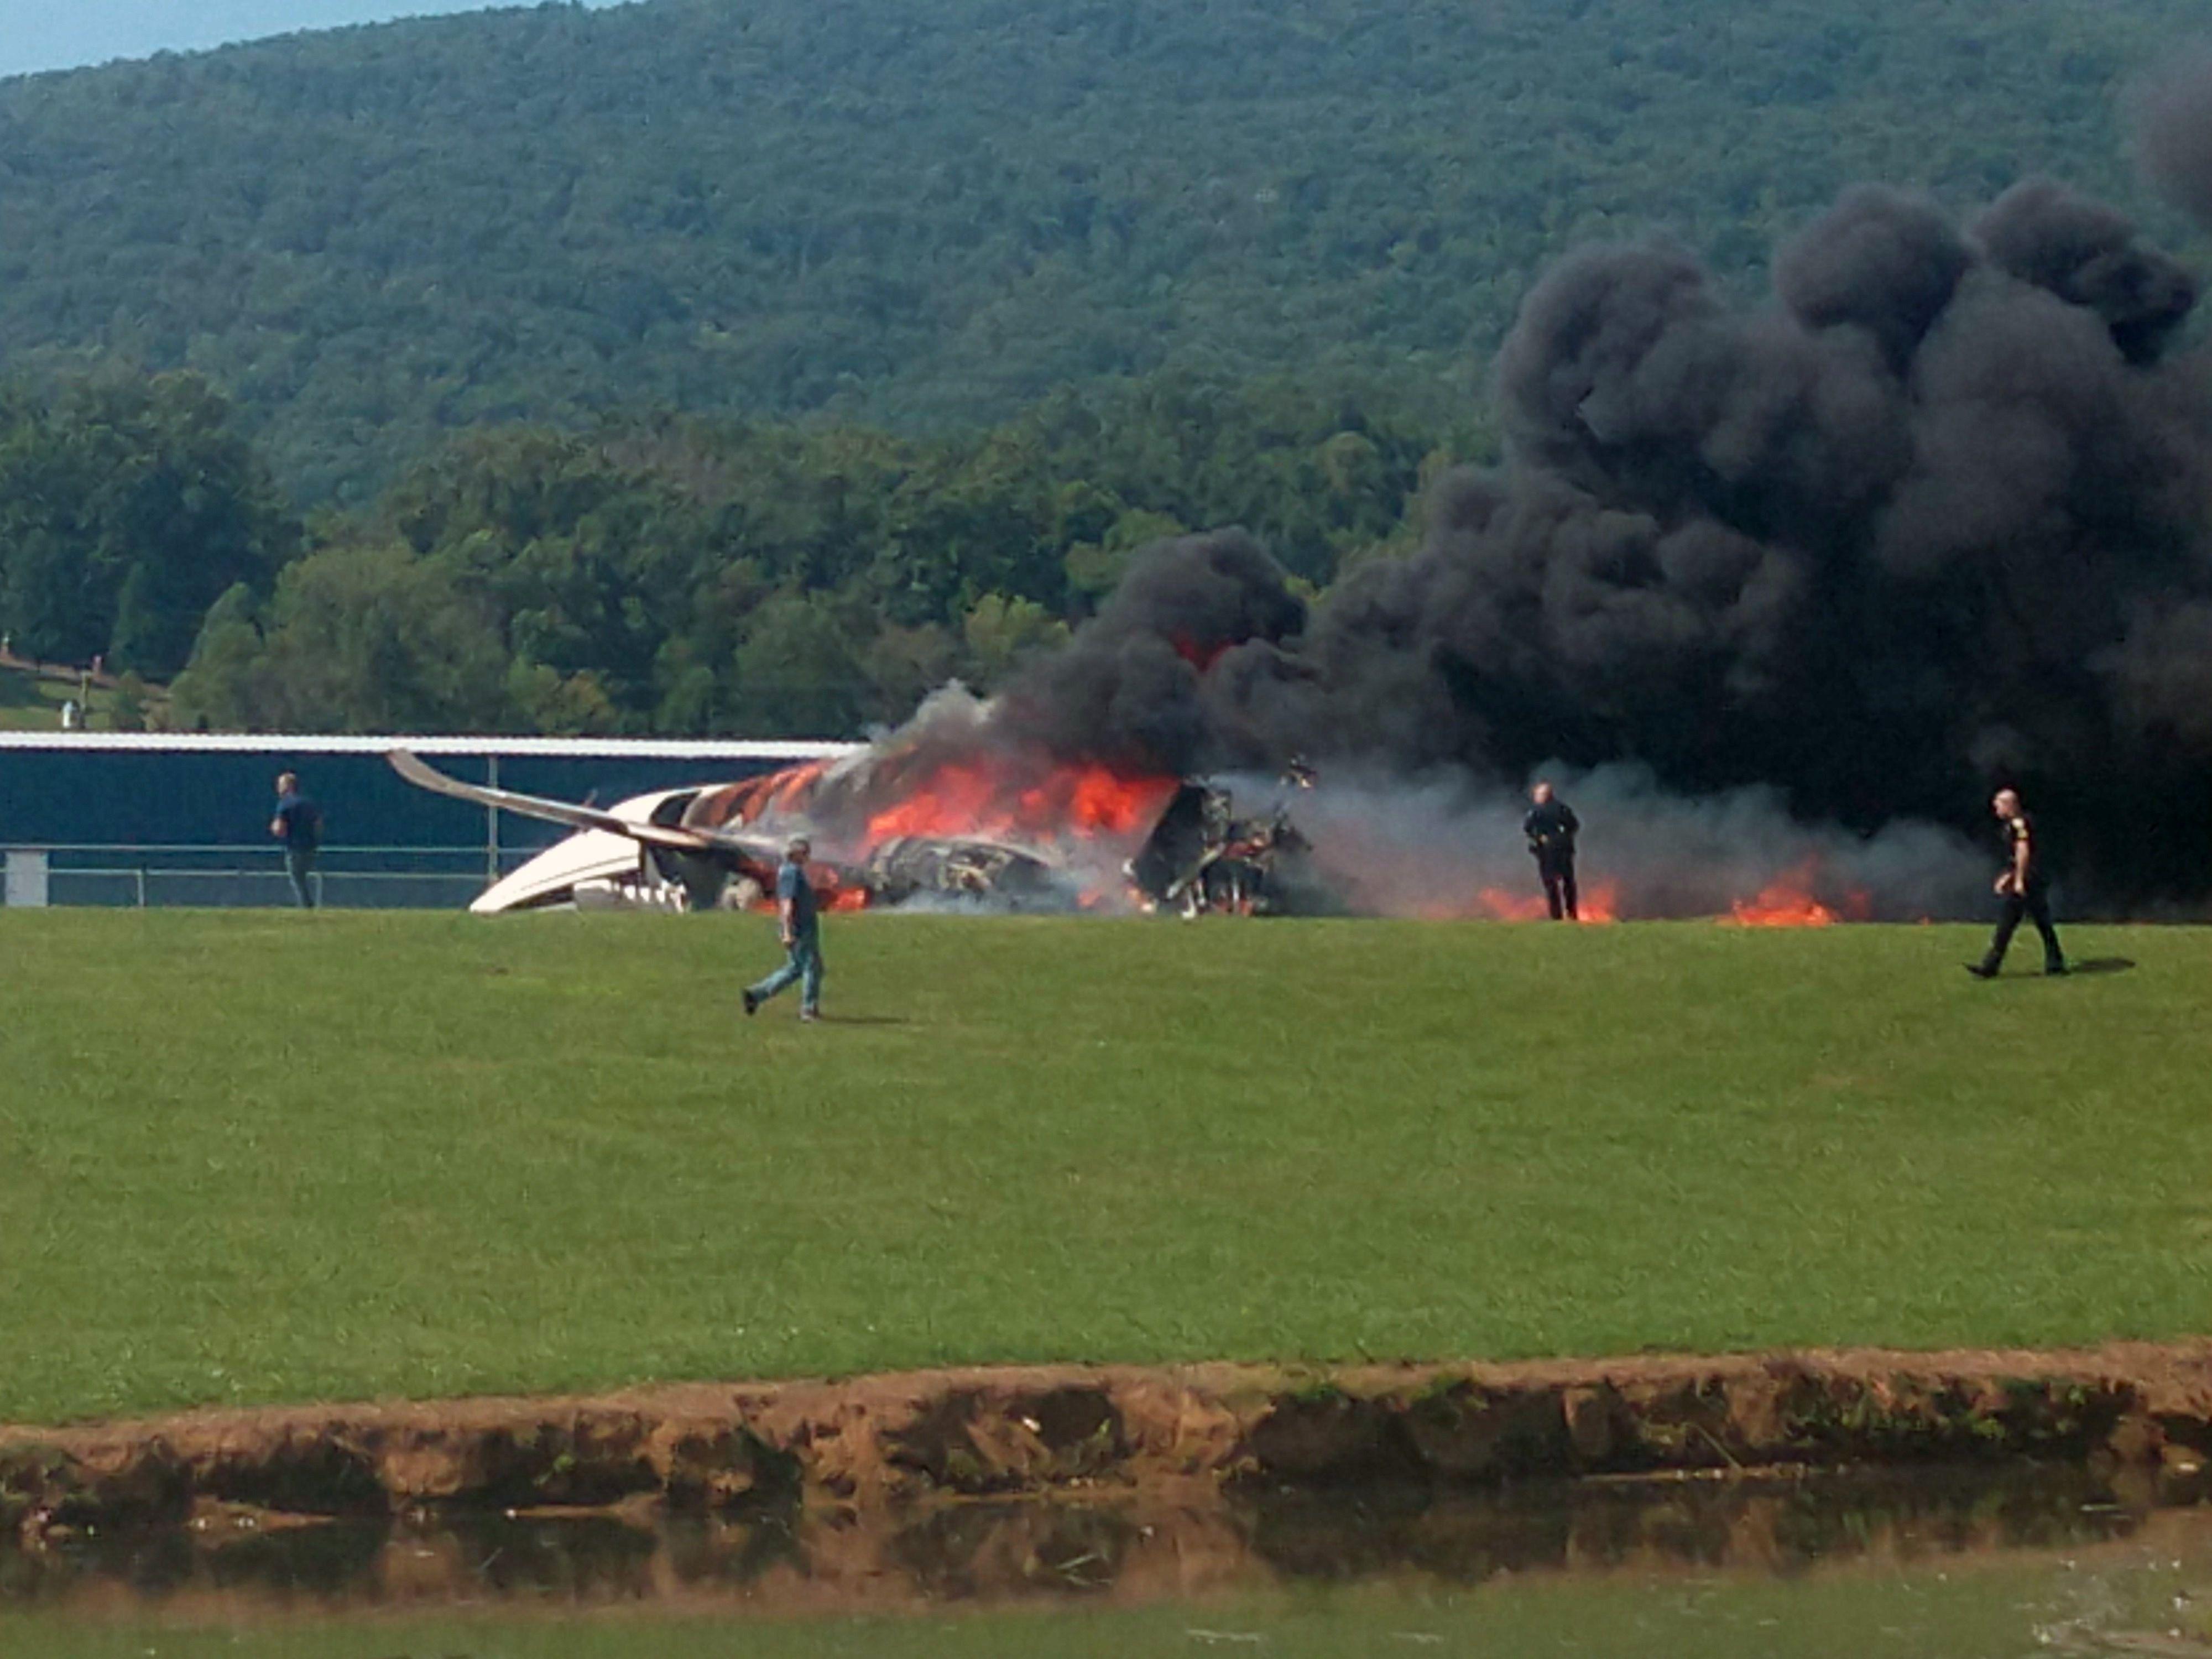 Dale Earnhardt Jr. in a Fiery Plane Crash, Reportedly Unharmed